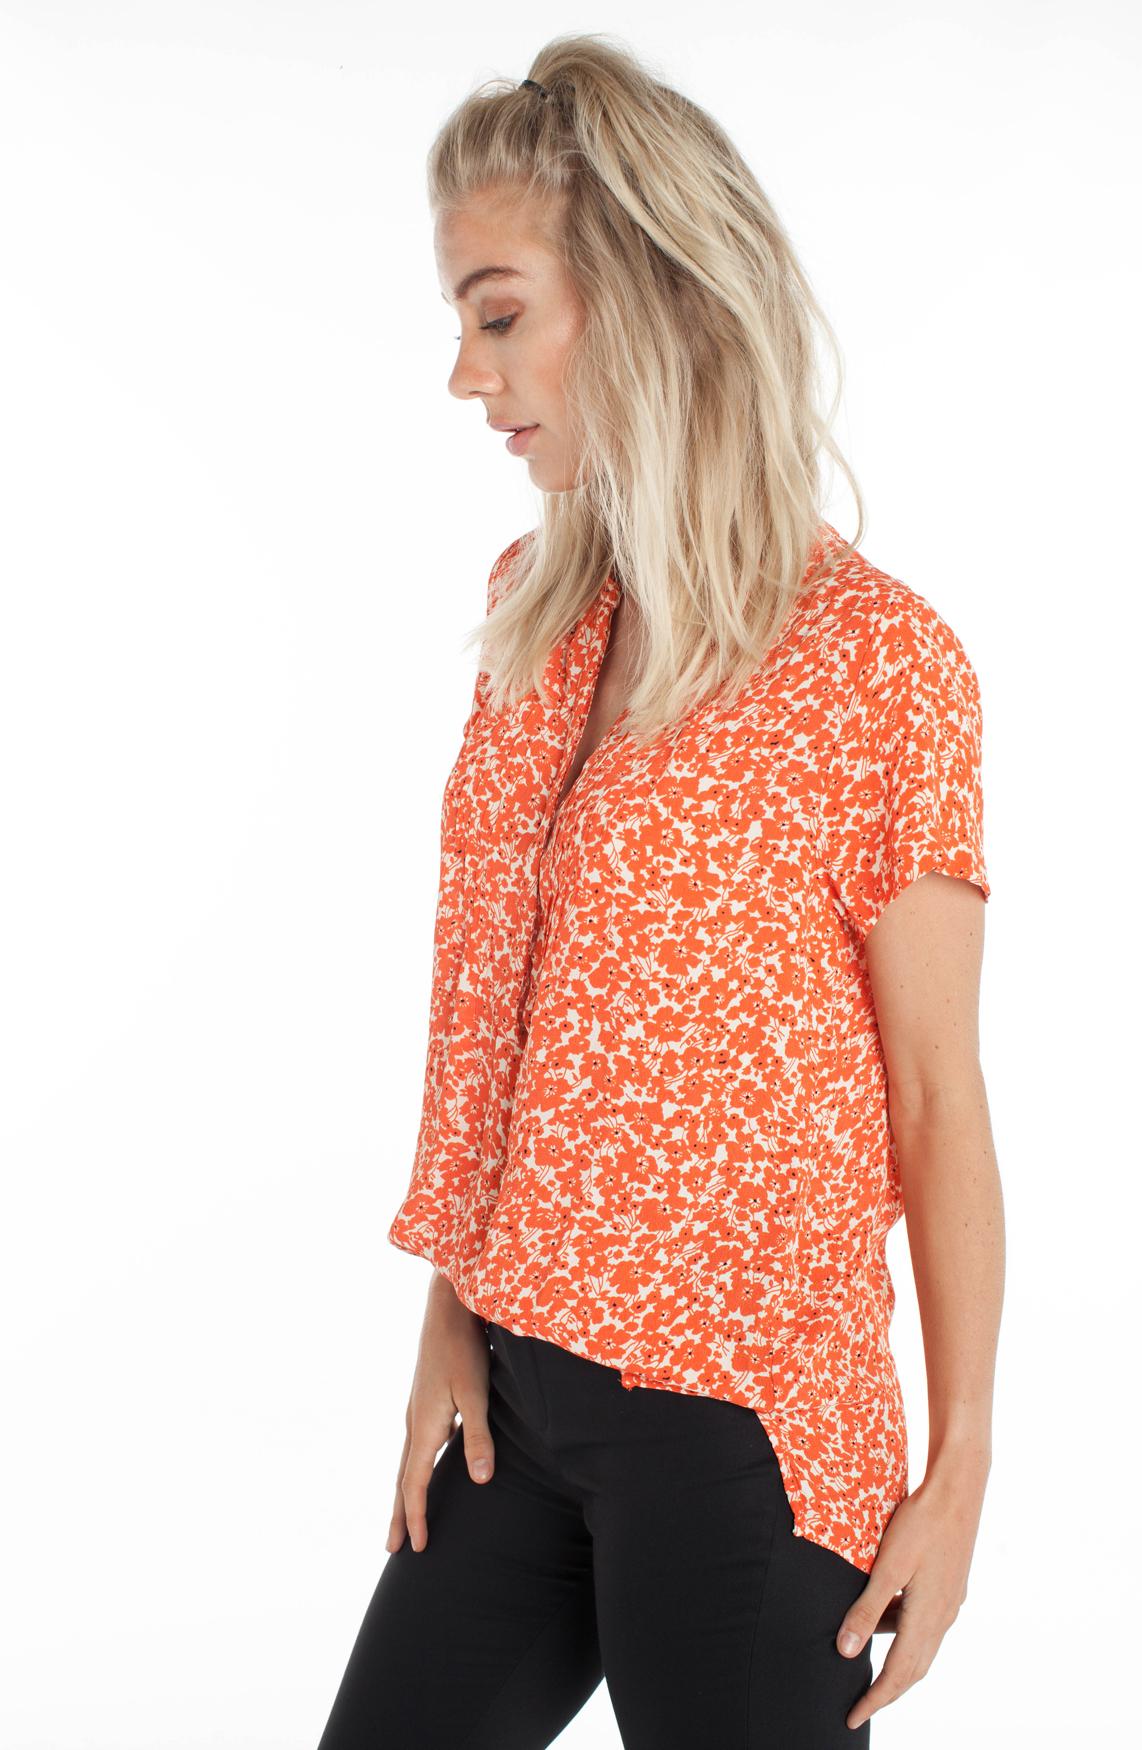 Lollys Laundry Dames Heather gebloemde blouse Oranje